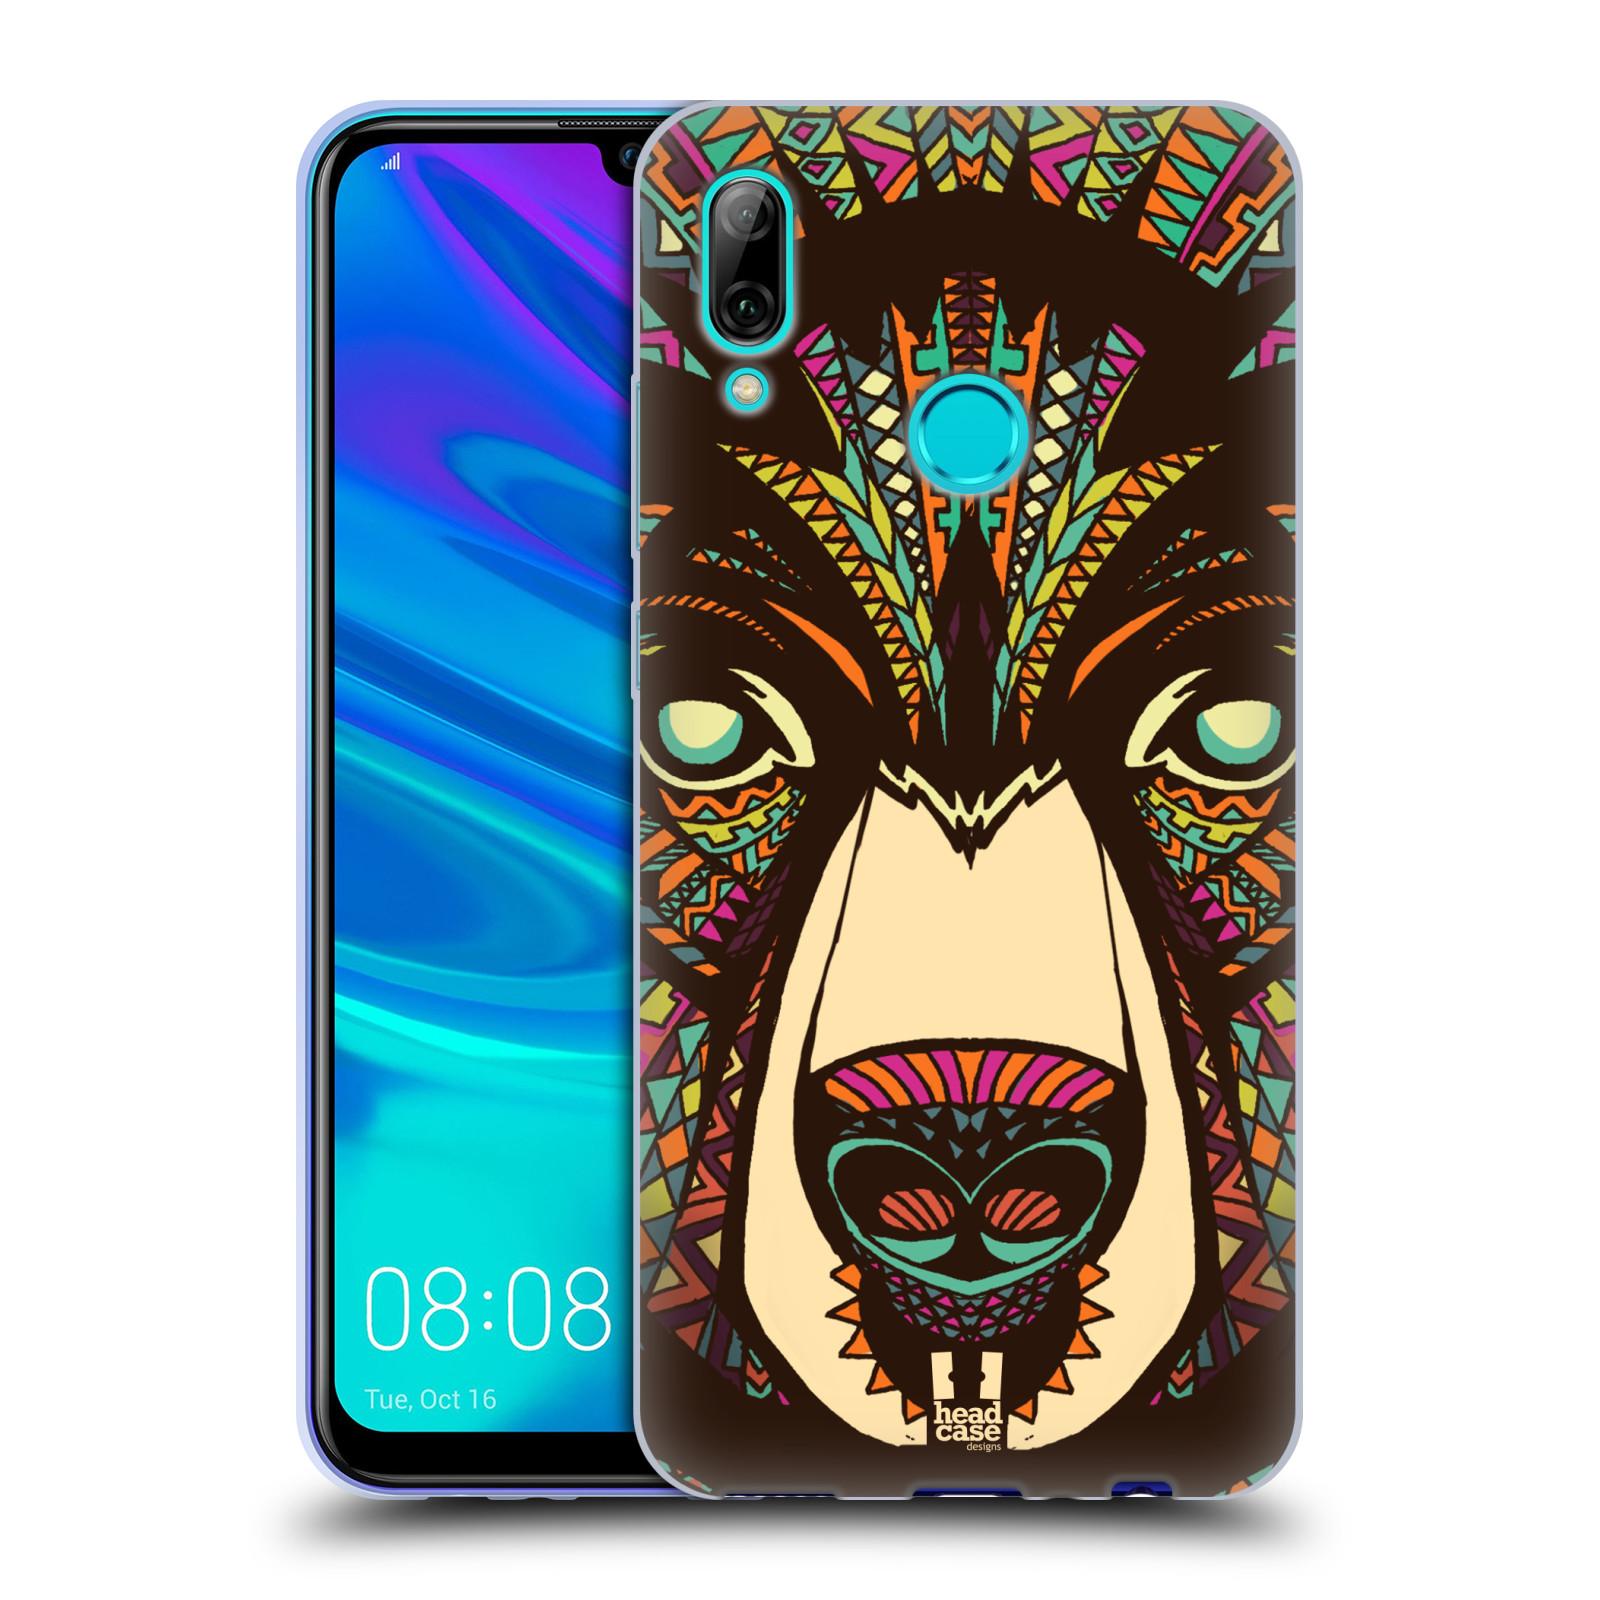 Silikonové pouzdro na mobil Huawei P Smart (2019) - Head Case - AZTEC MEDVĚD